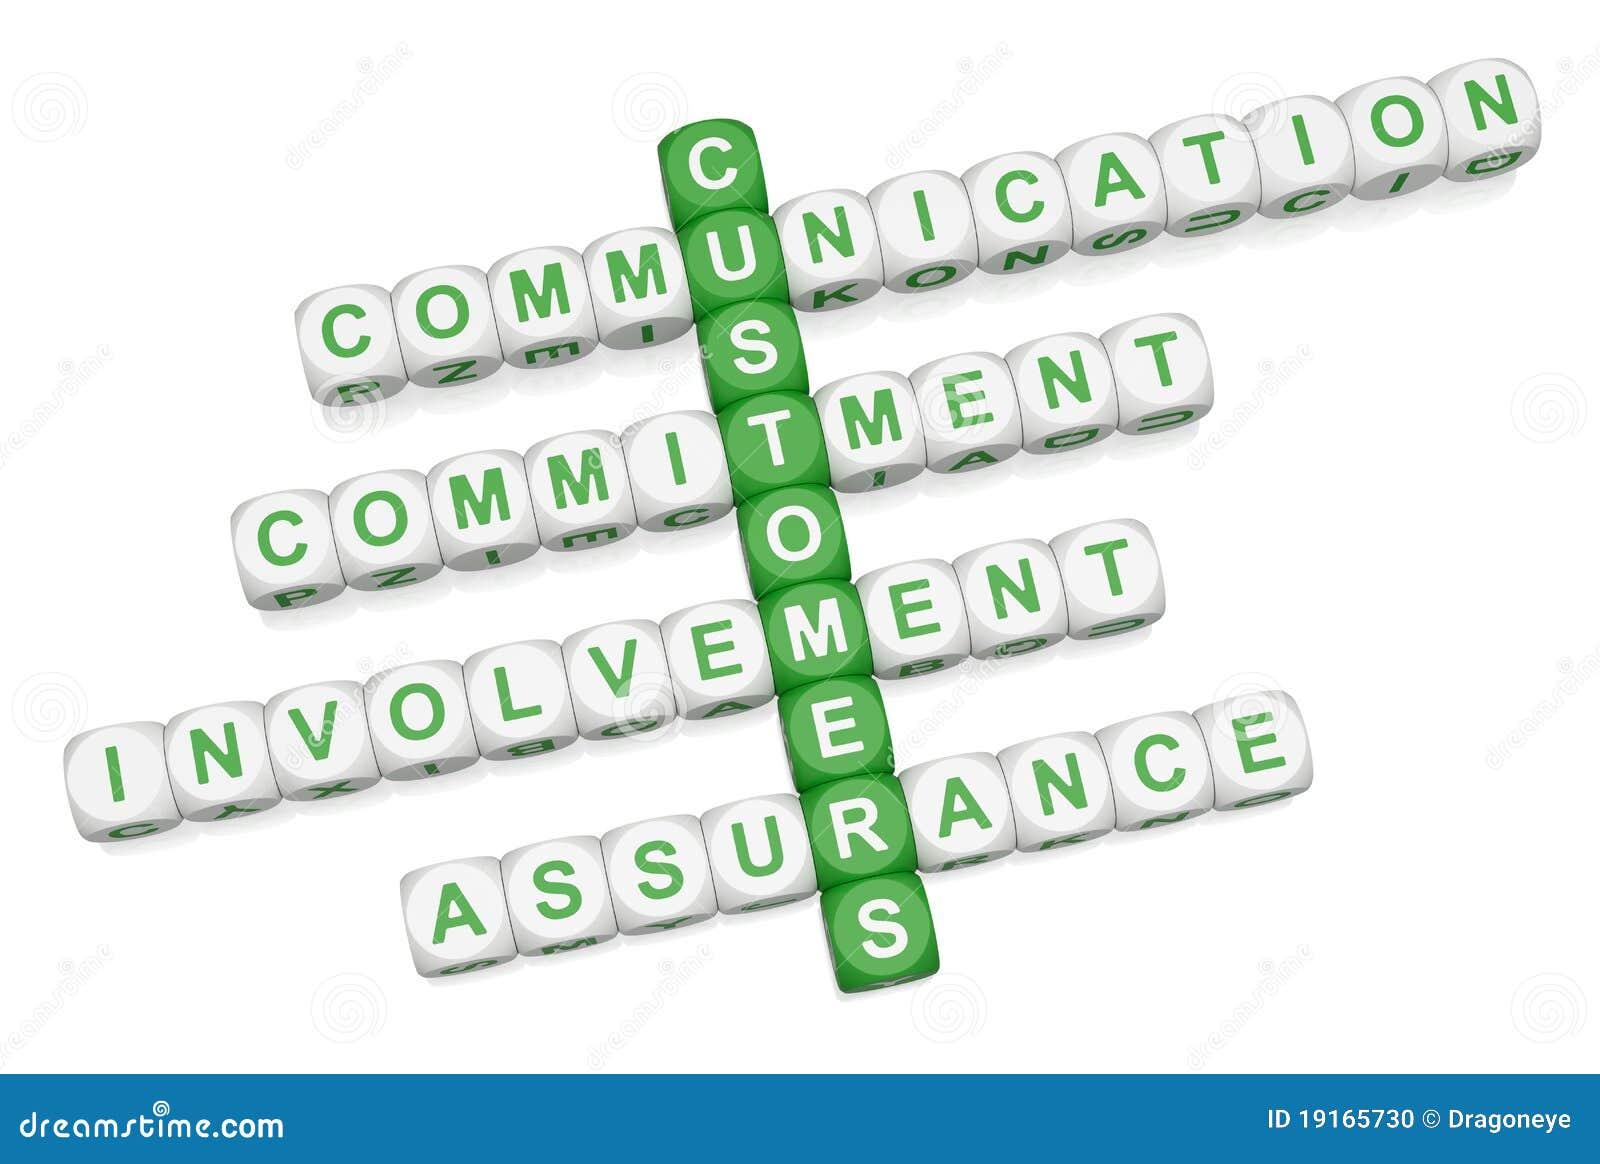 Customer Relations Crossword 3D Stock Photo